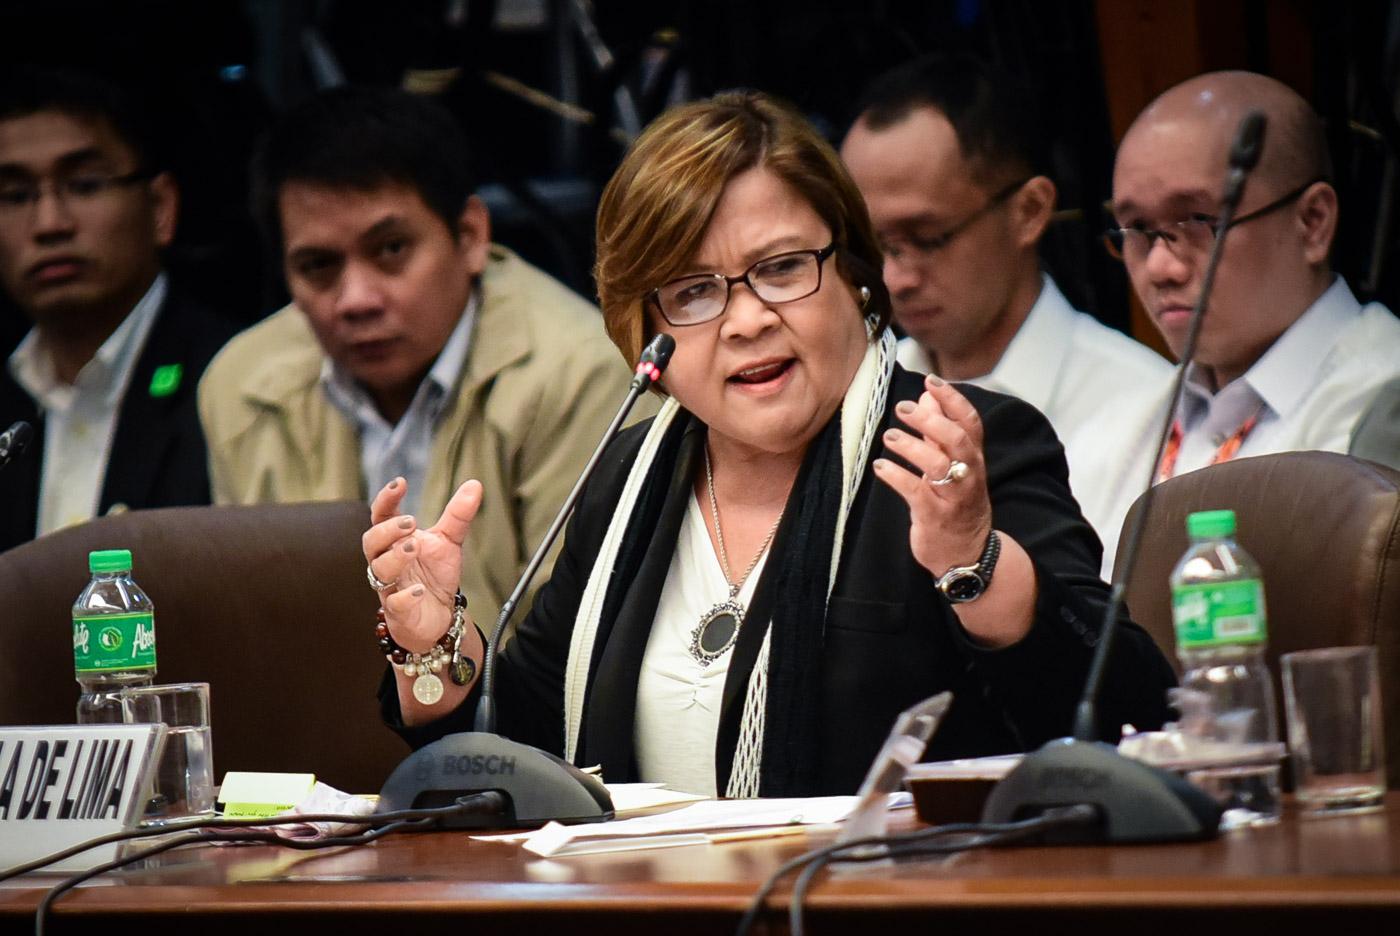 ESPINOSA PROBE. Senator Leila de Lima, who has been accused of getting drug money from Kerwin Espinosa, at the Senate probe into the death of the late mayor Espinosa. Photo by LeAnne Jazul/Rappler